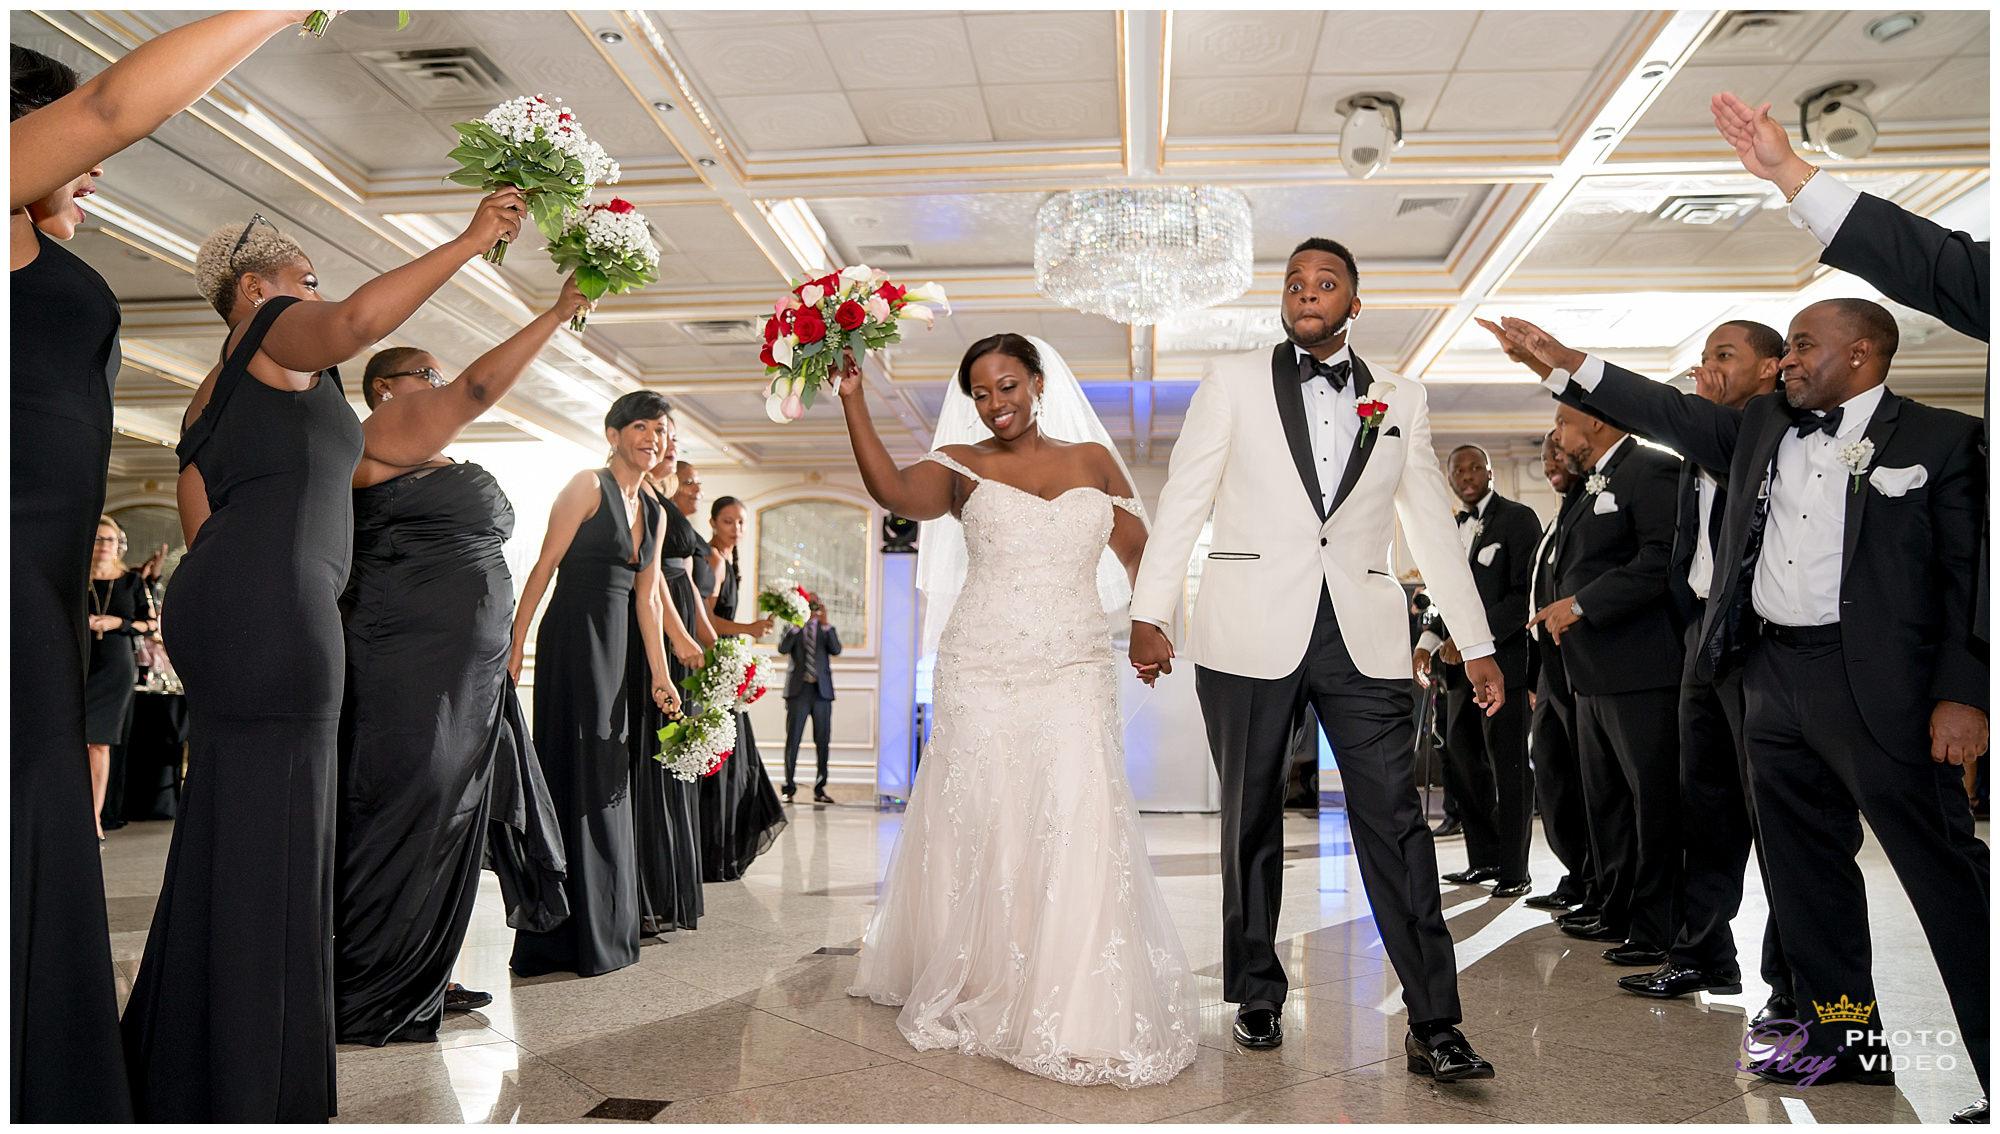 Royal_Manor_Garfield_NJ_Christian_Wedding_Jade_Scott-0020.jpg